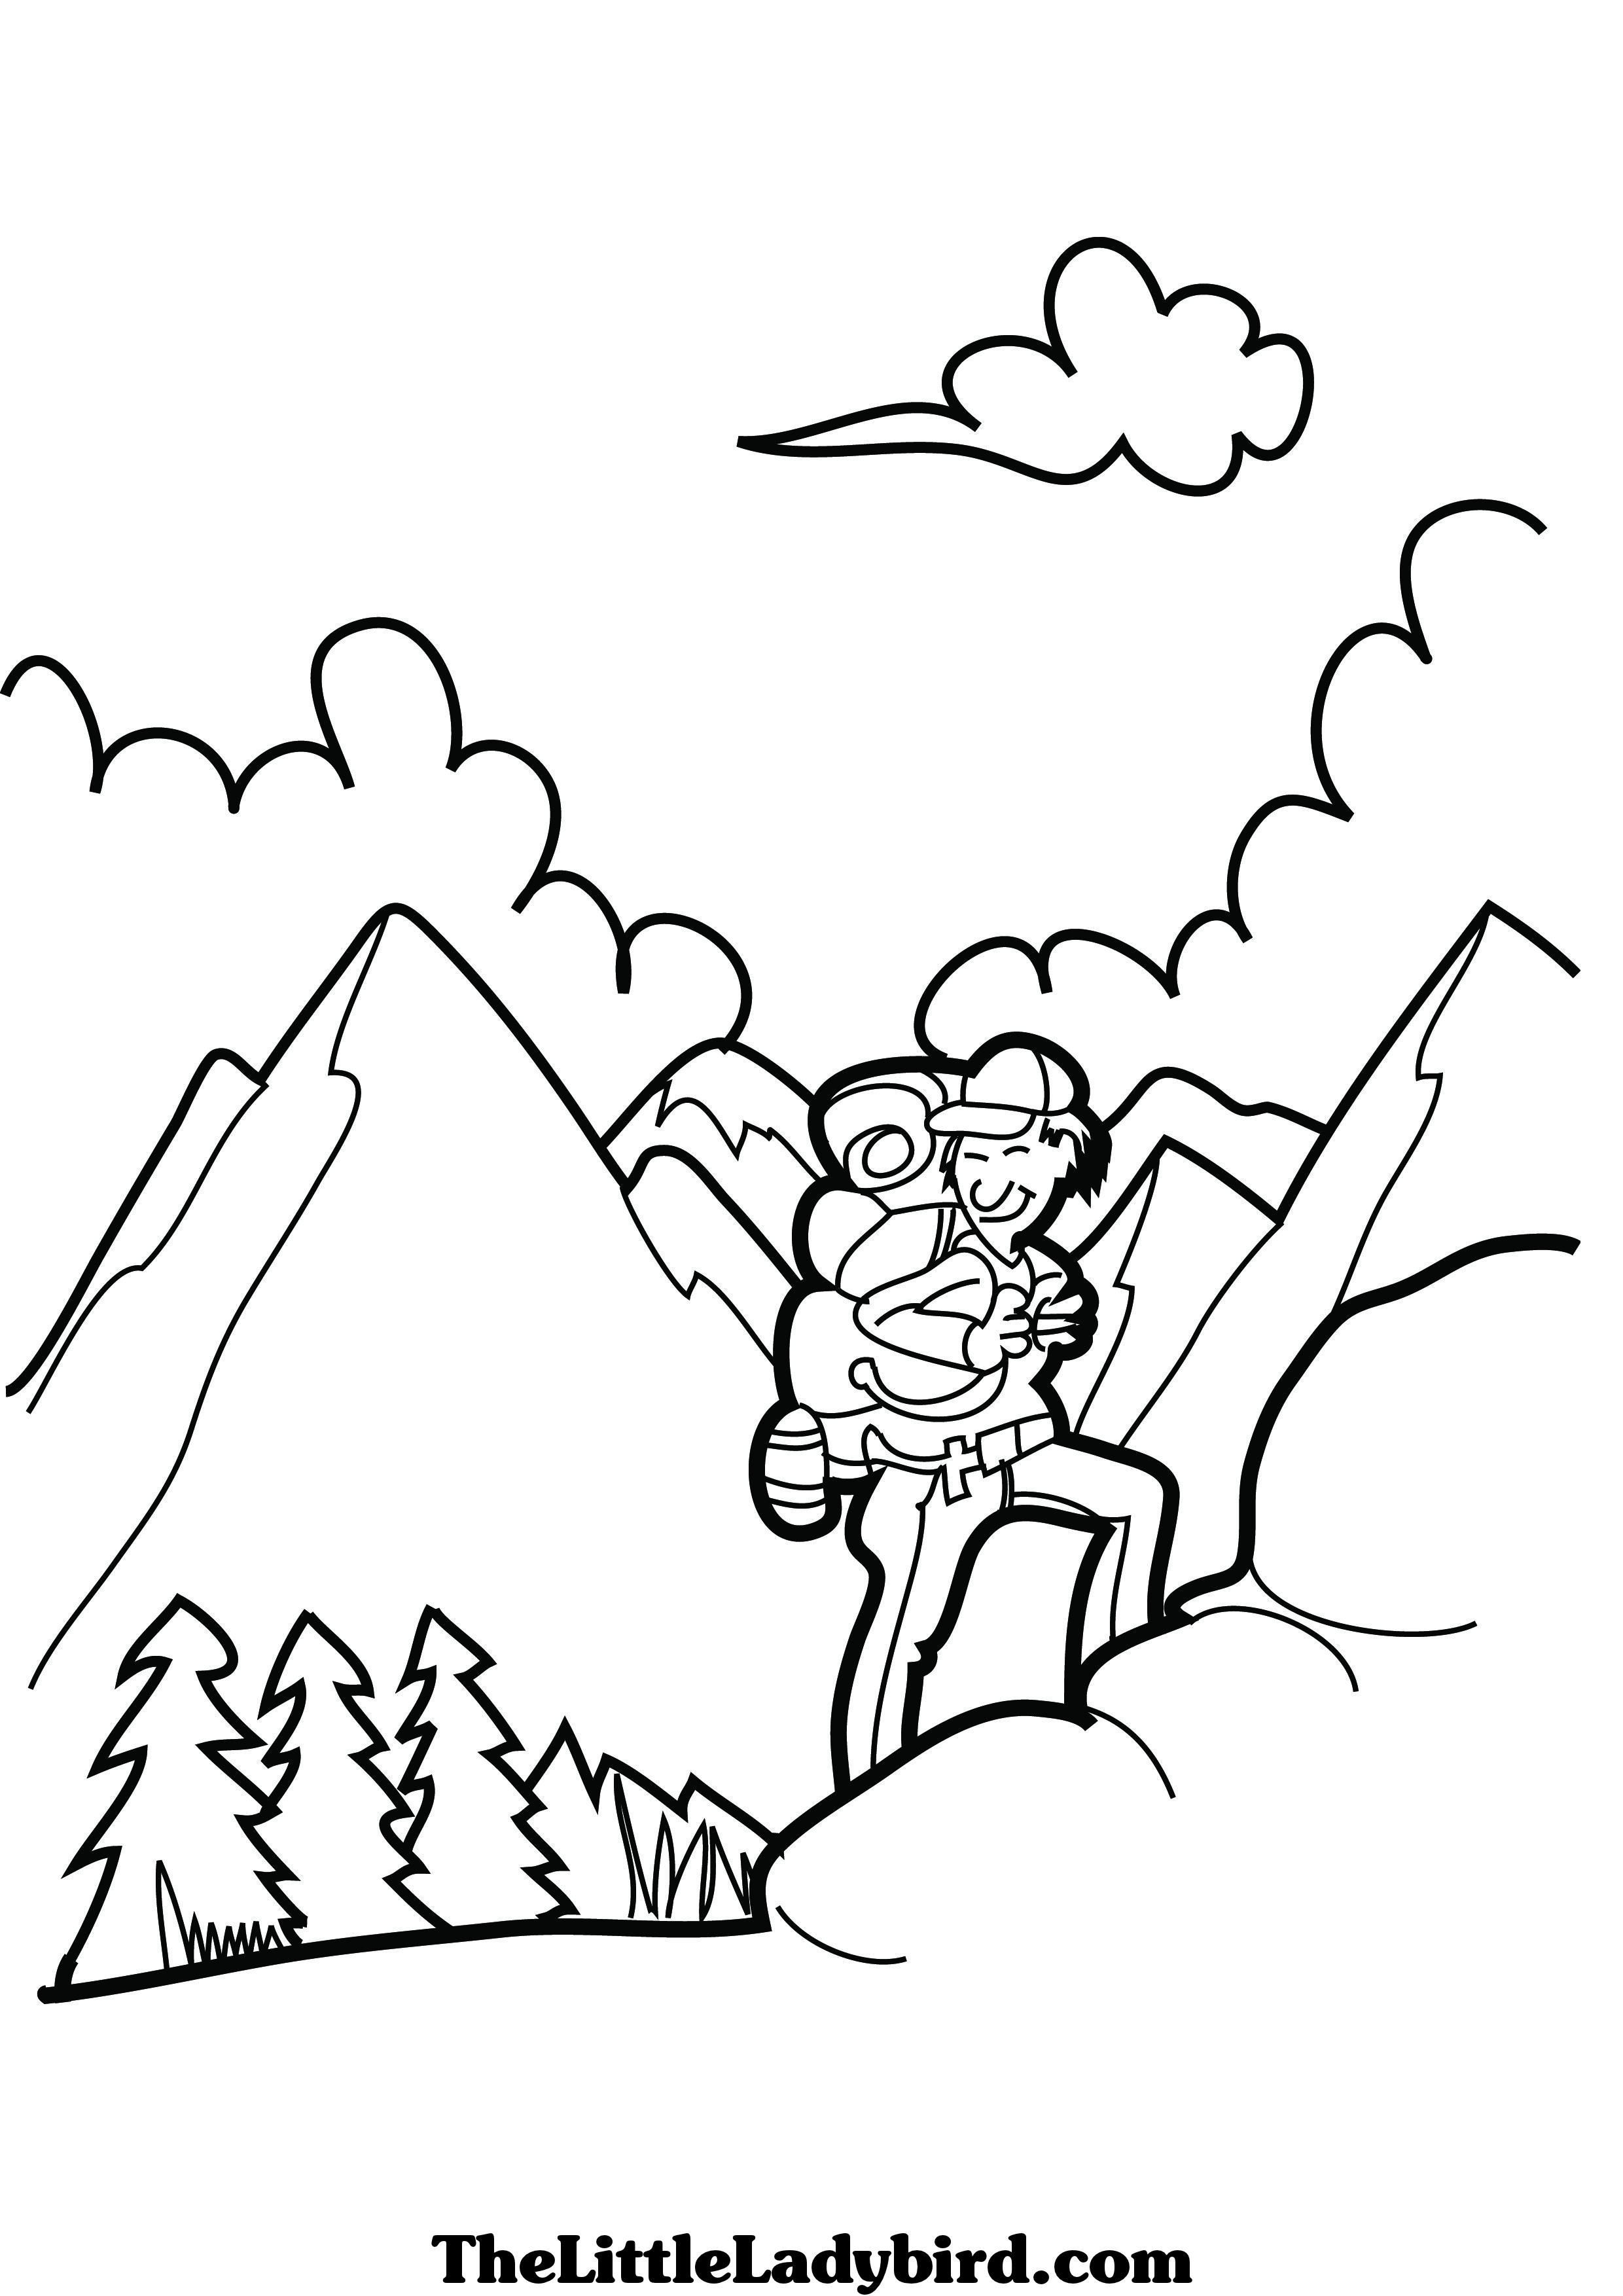 2480x3508 Rare Mountain Climber Coloring Page Climbing P